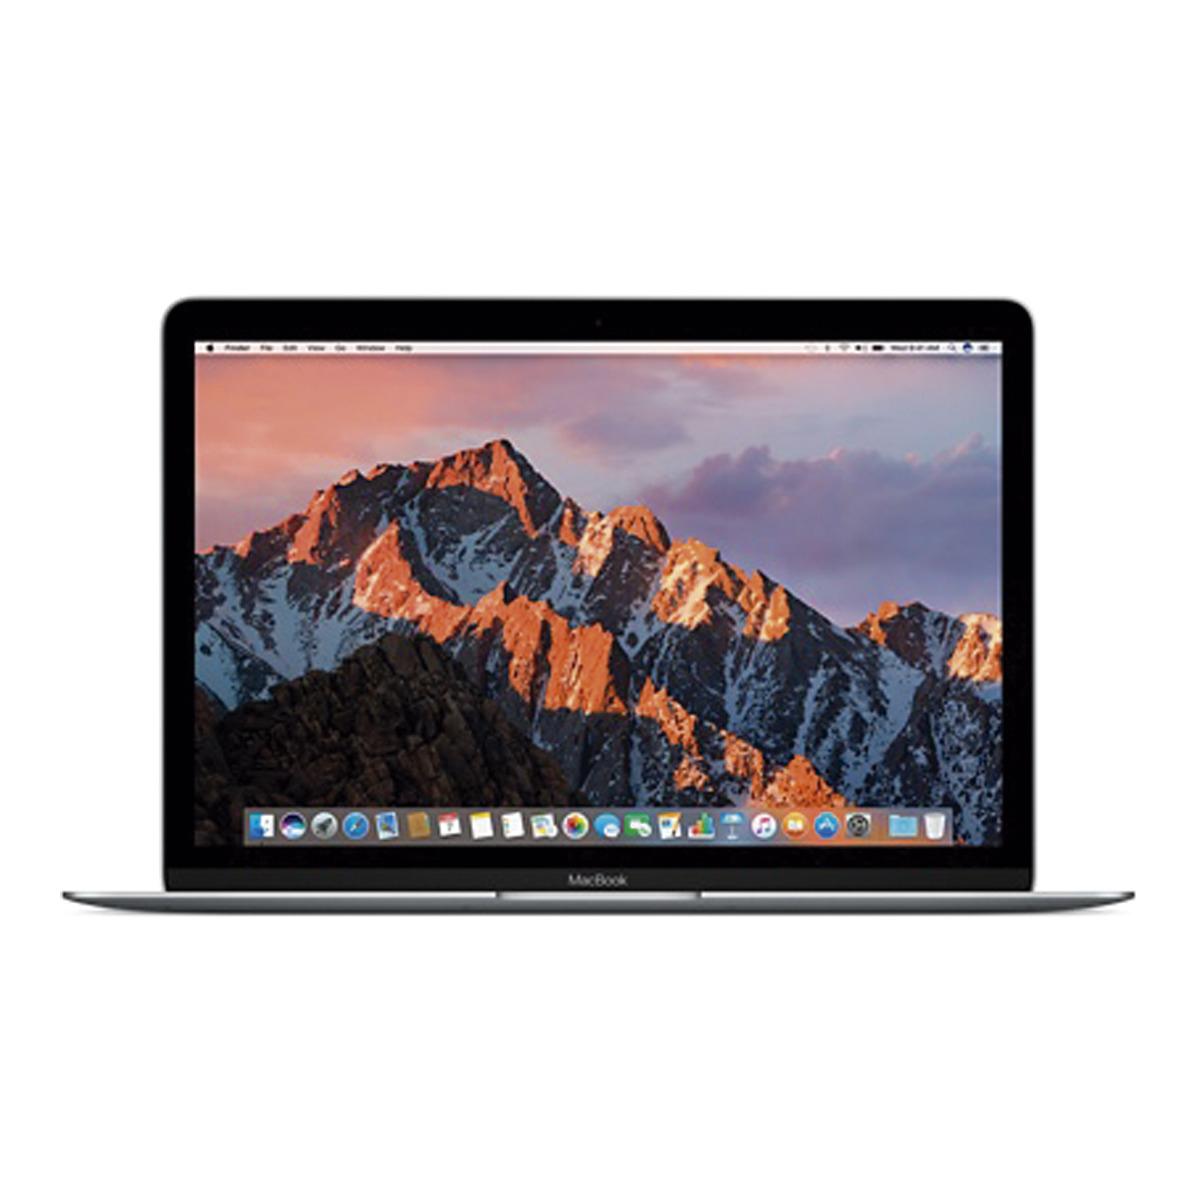 Macbook 12 pulgadas i5 doble núcleo, 8gb de ram y 512 gb ssd